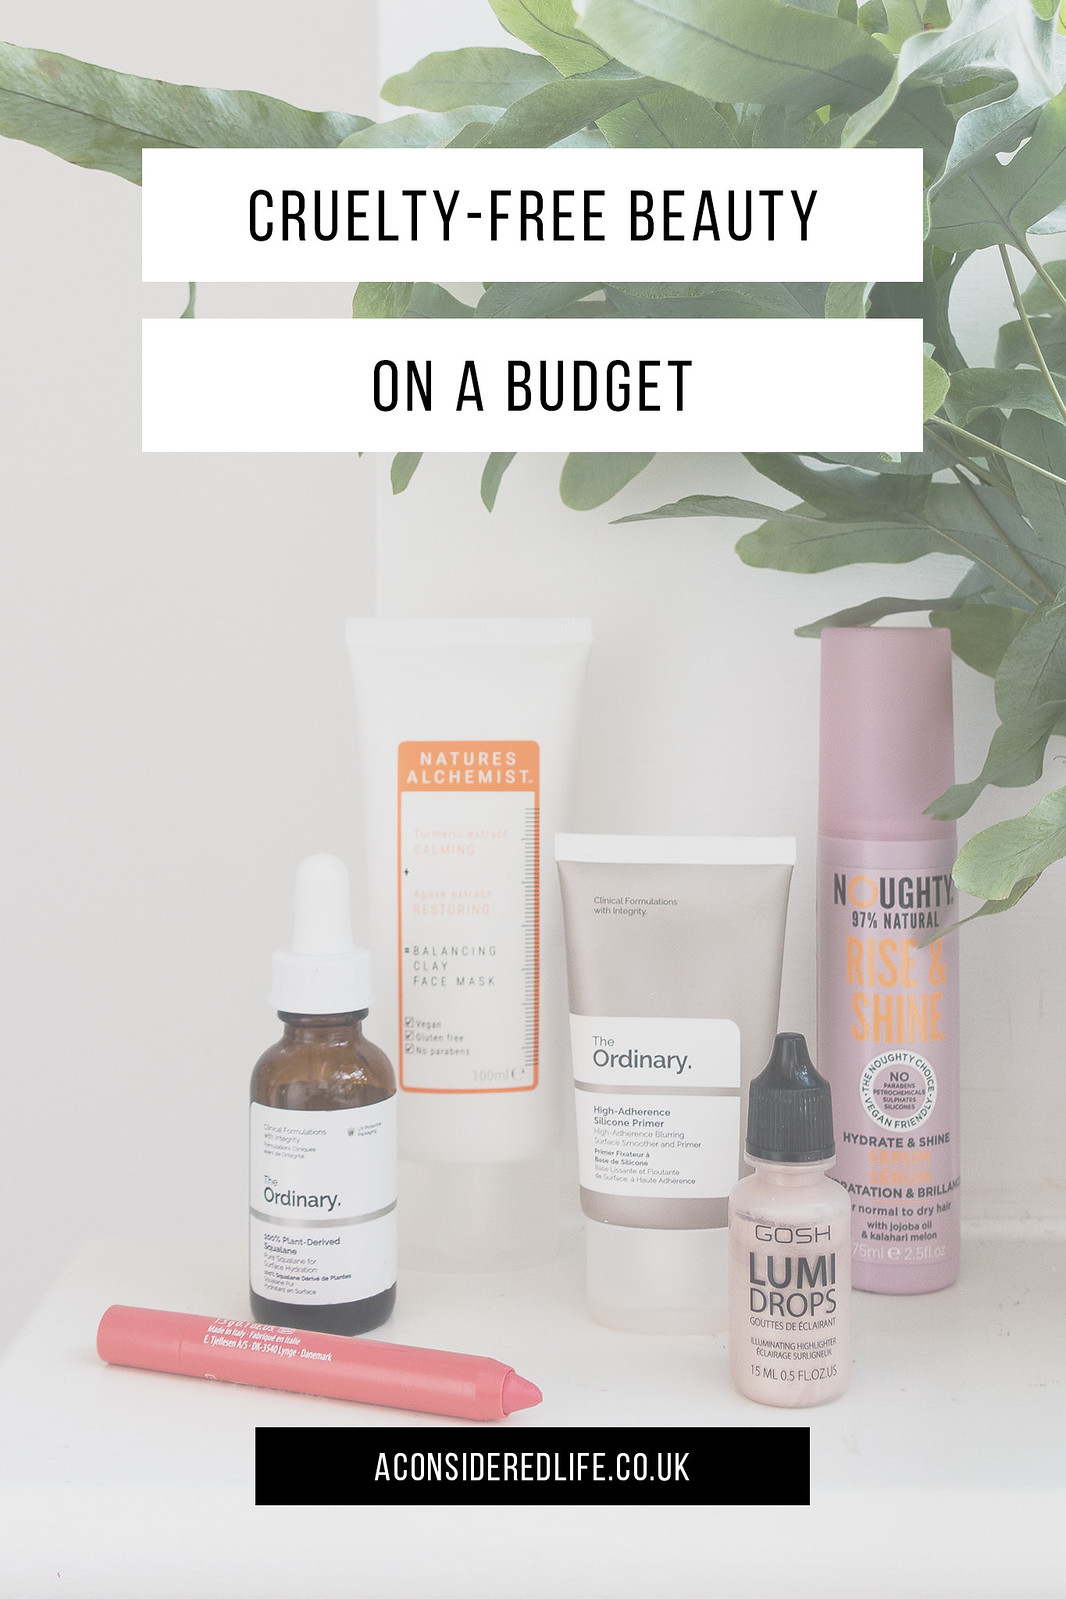 Cruelty Free Beauty on a Budget